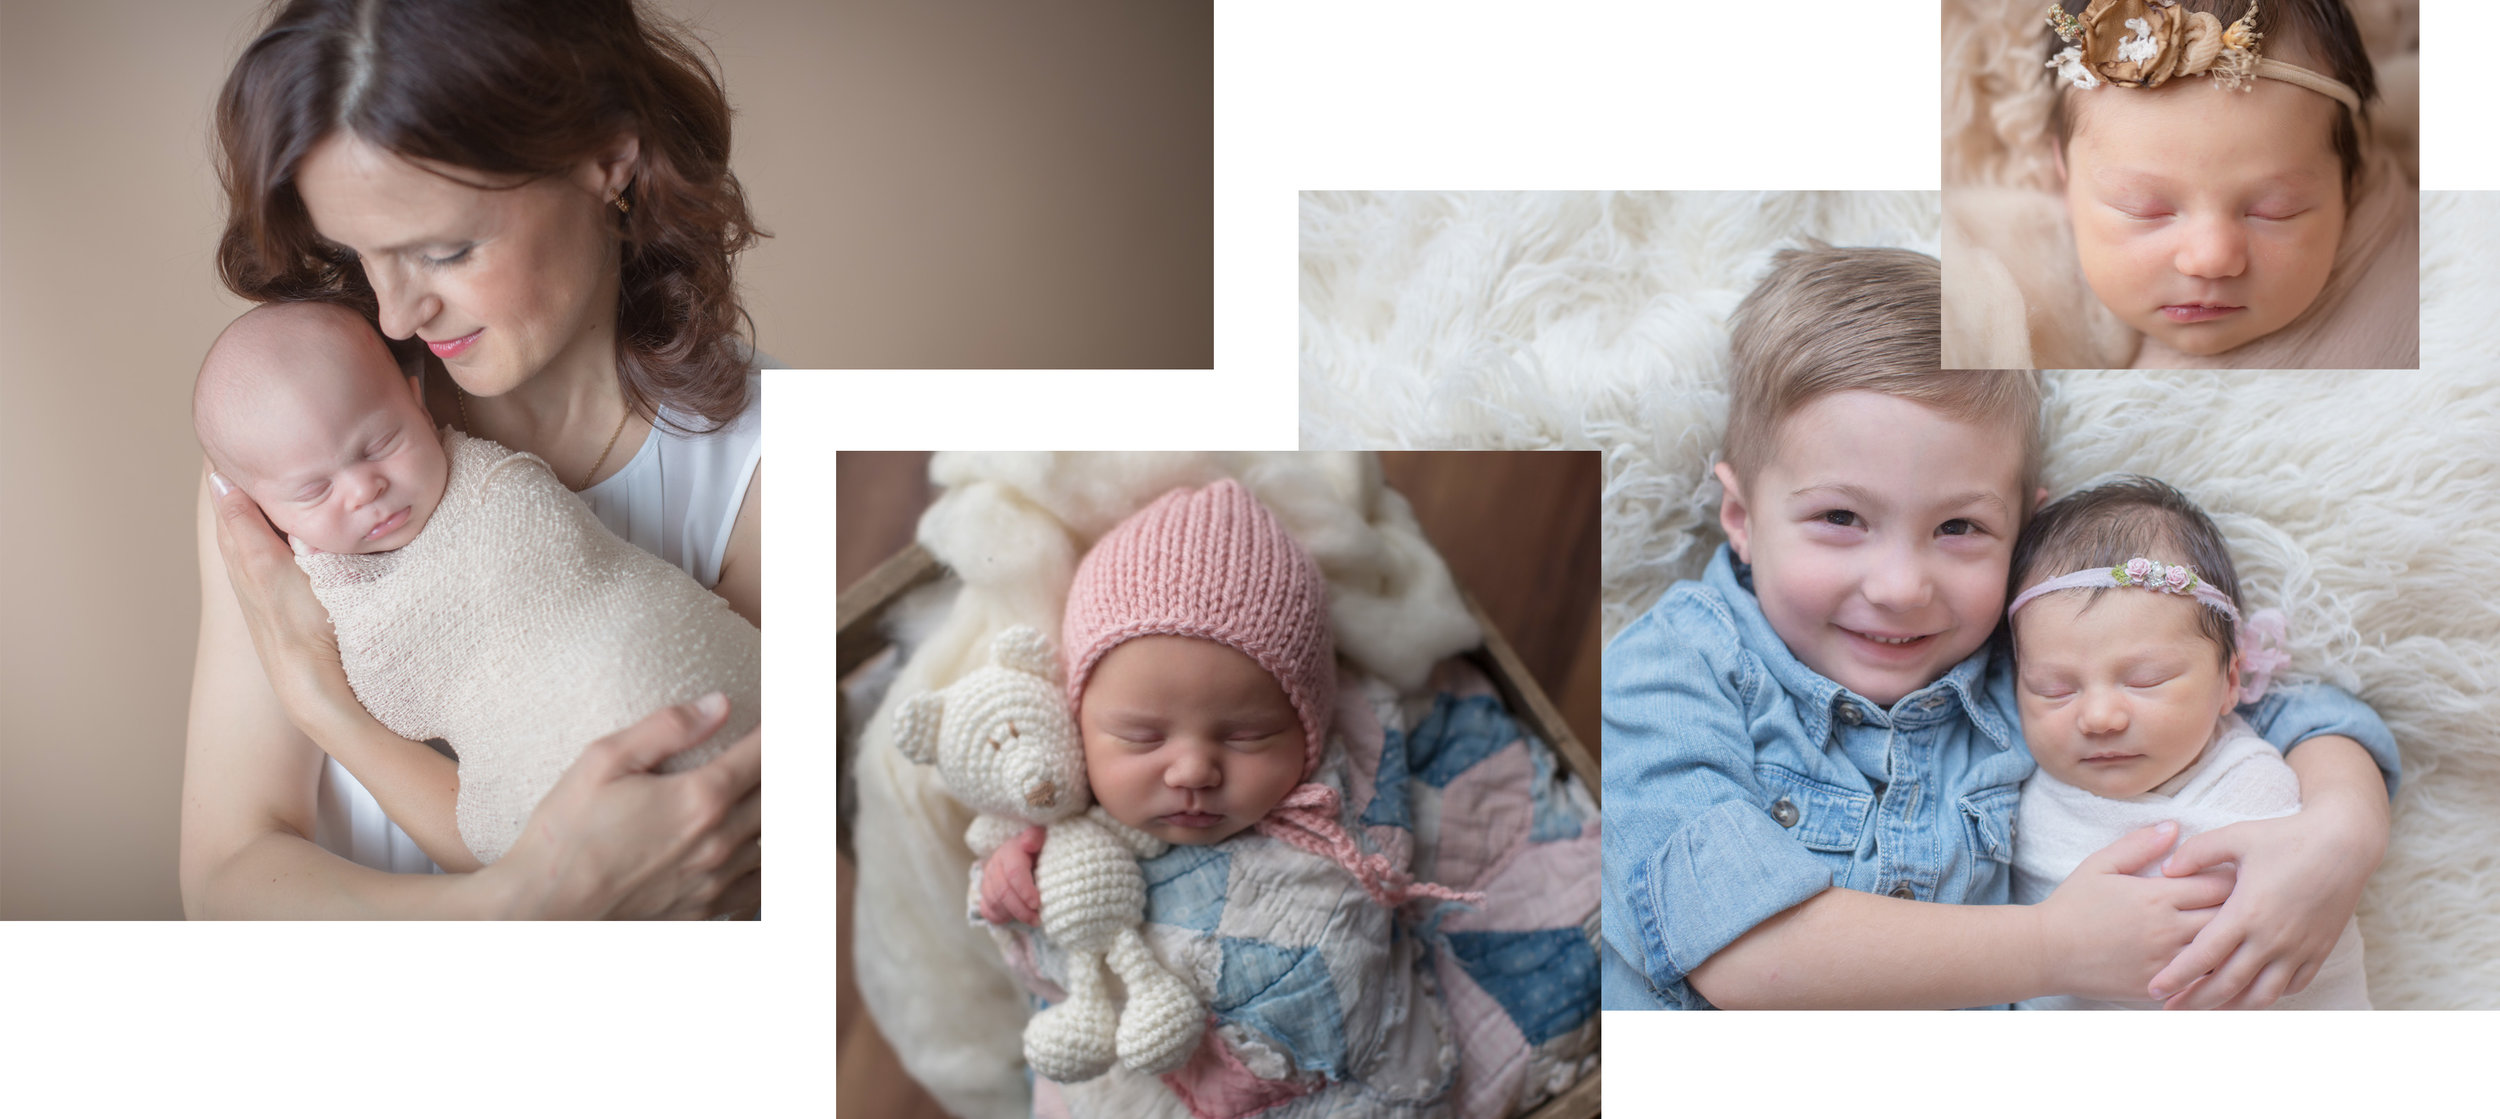 Flint baby photographer capturing professional photos